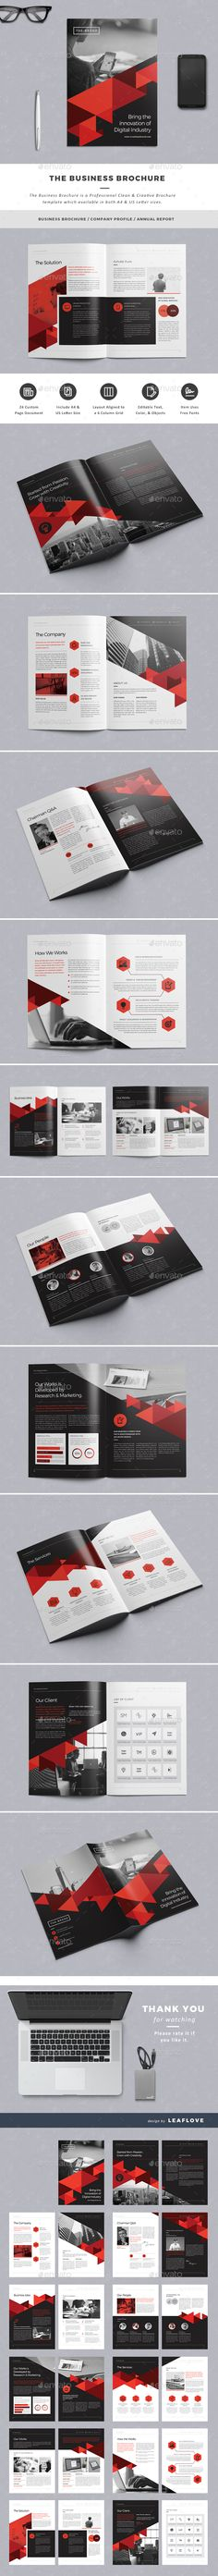 The Business Brochure Template InDesign INDD #design Download: http://graphicriver.net/item/the-business-brochure/14474584?ref=ksioks